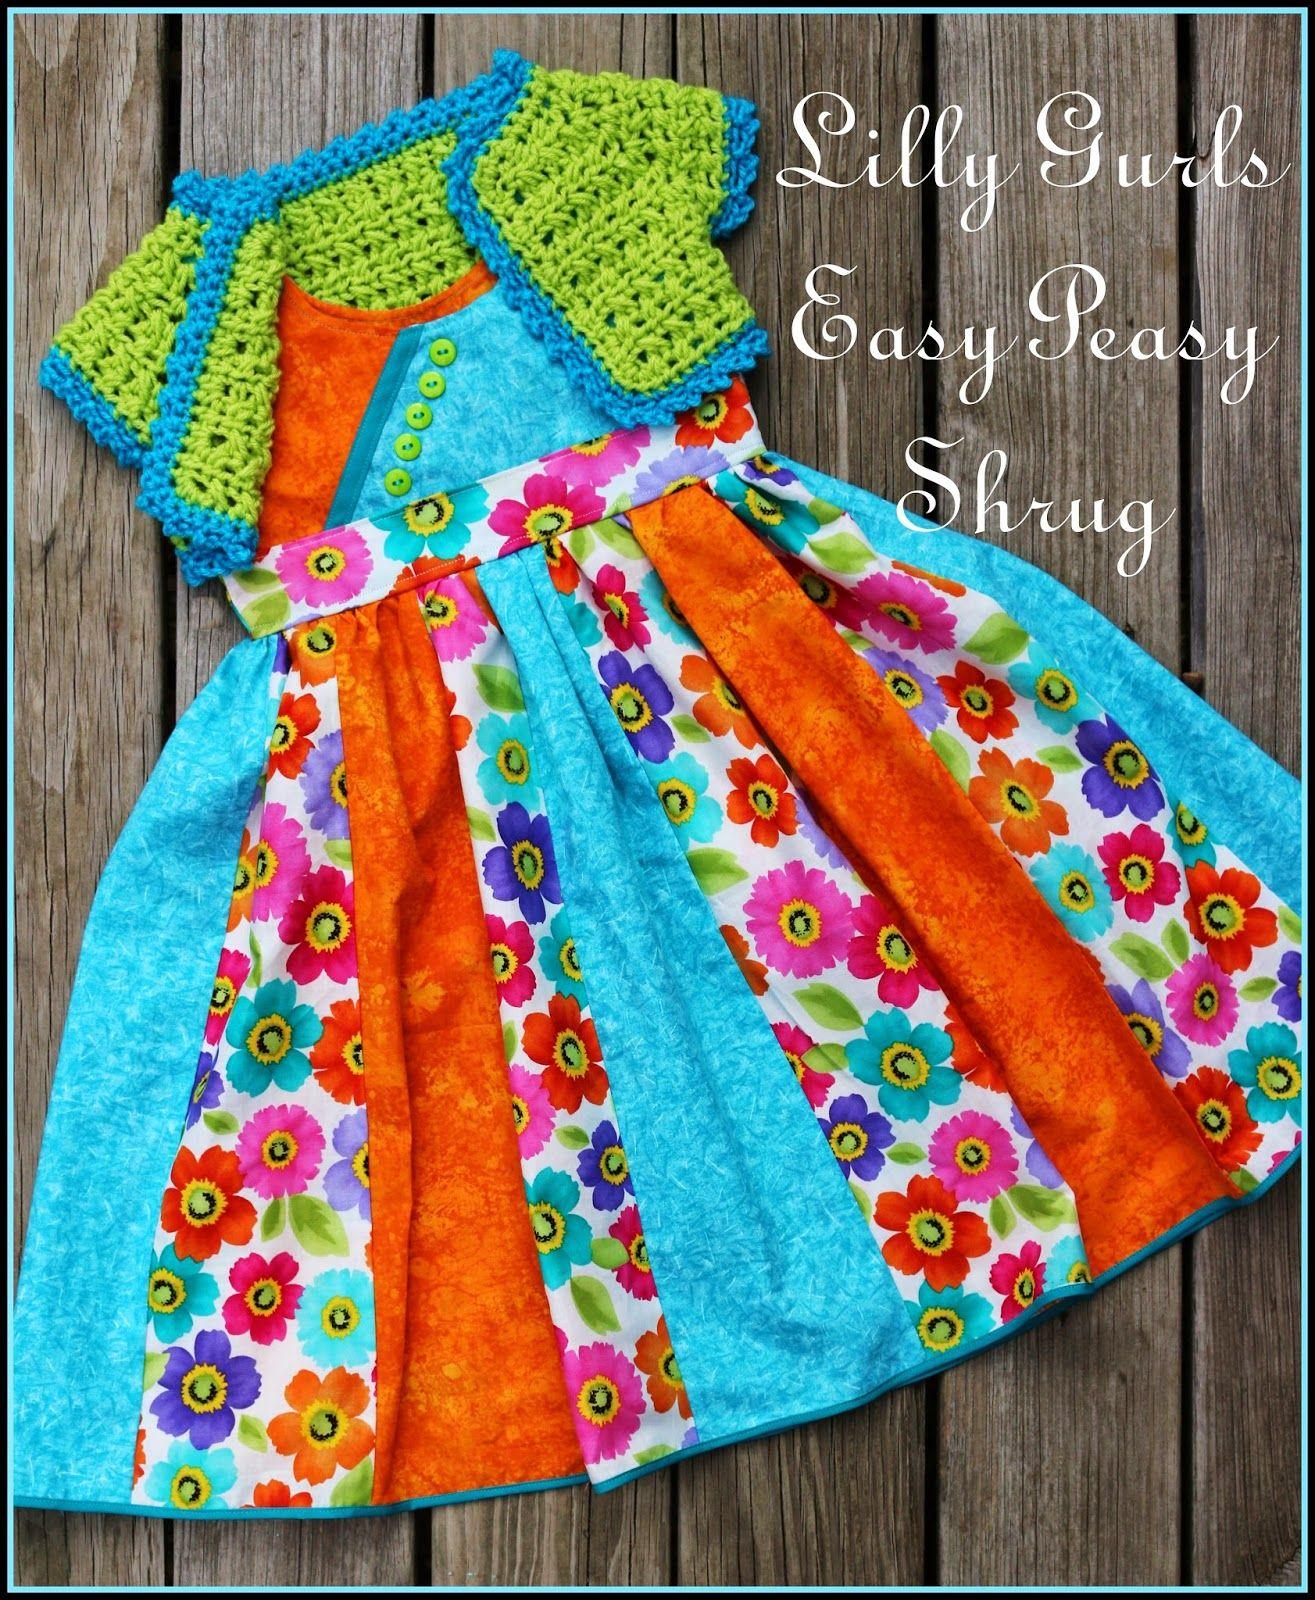 Crochet Supernova: Lilly Gurls Easy Peasy Shrug ~FREE PATTERN ...